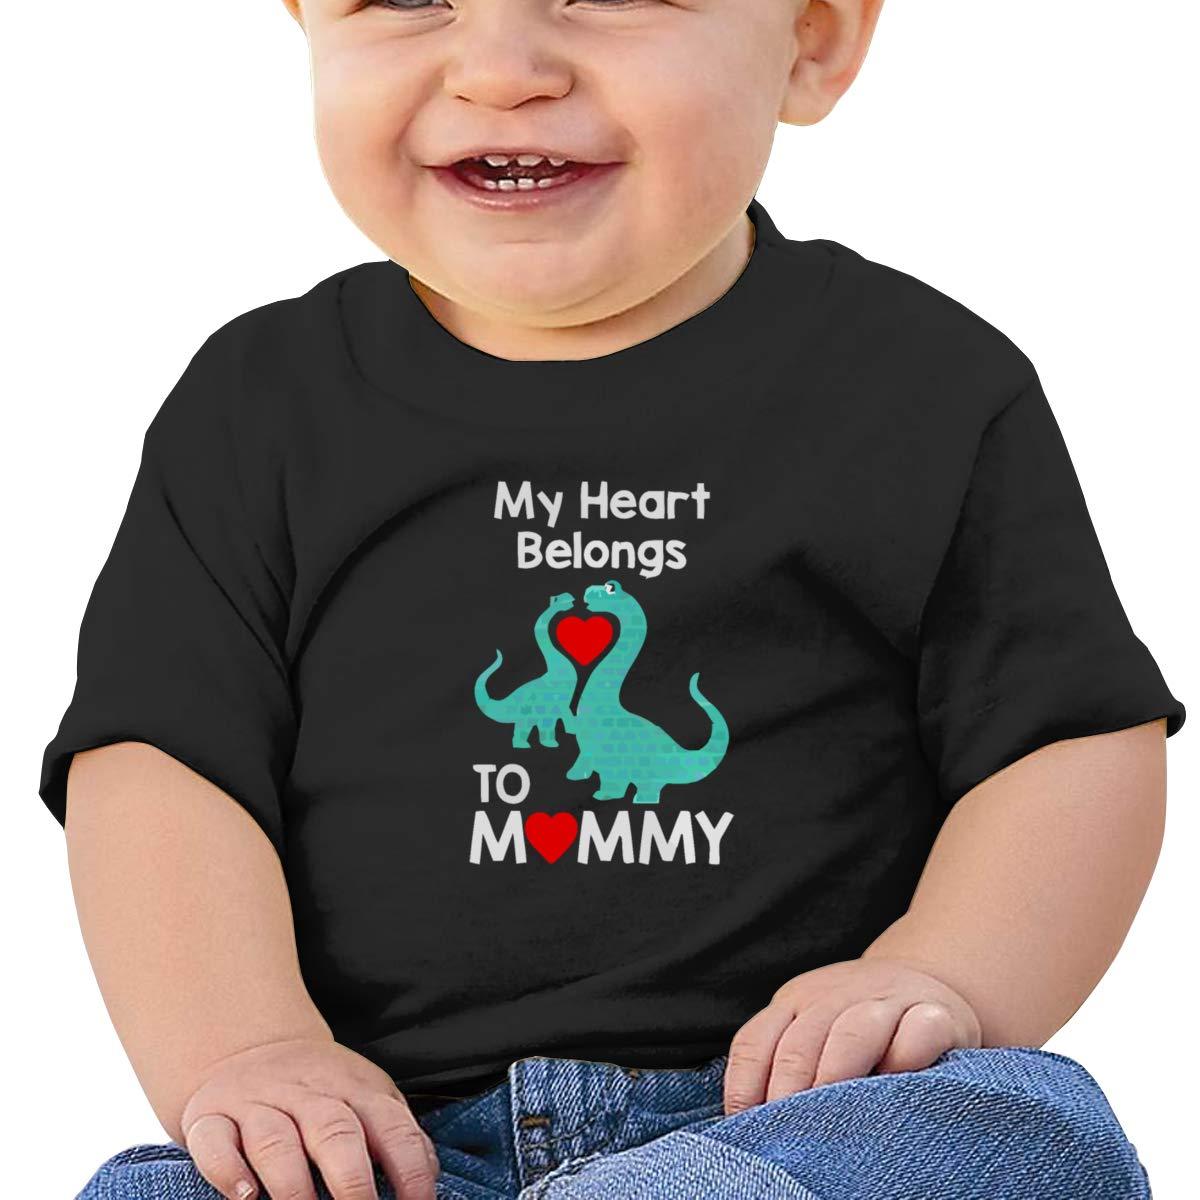 Arsmt My Heart Belongs to Mommy Toddler Short Sleeve Shirts Girls Birthday Gift